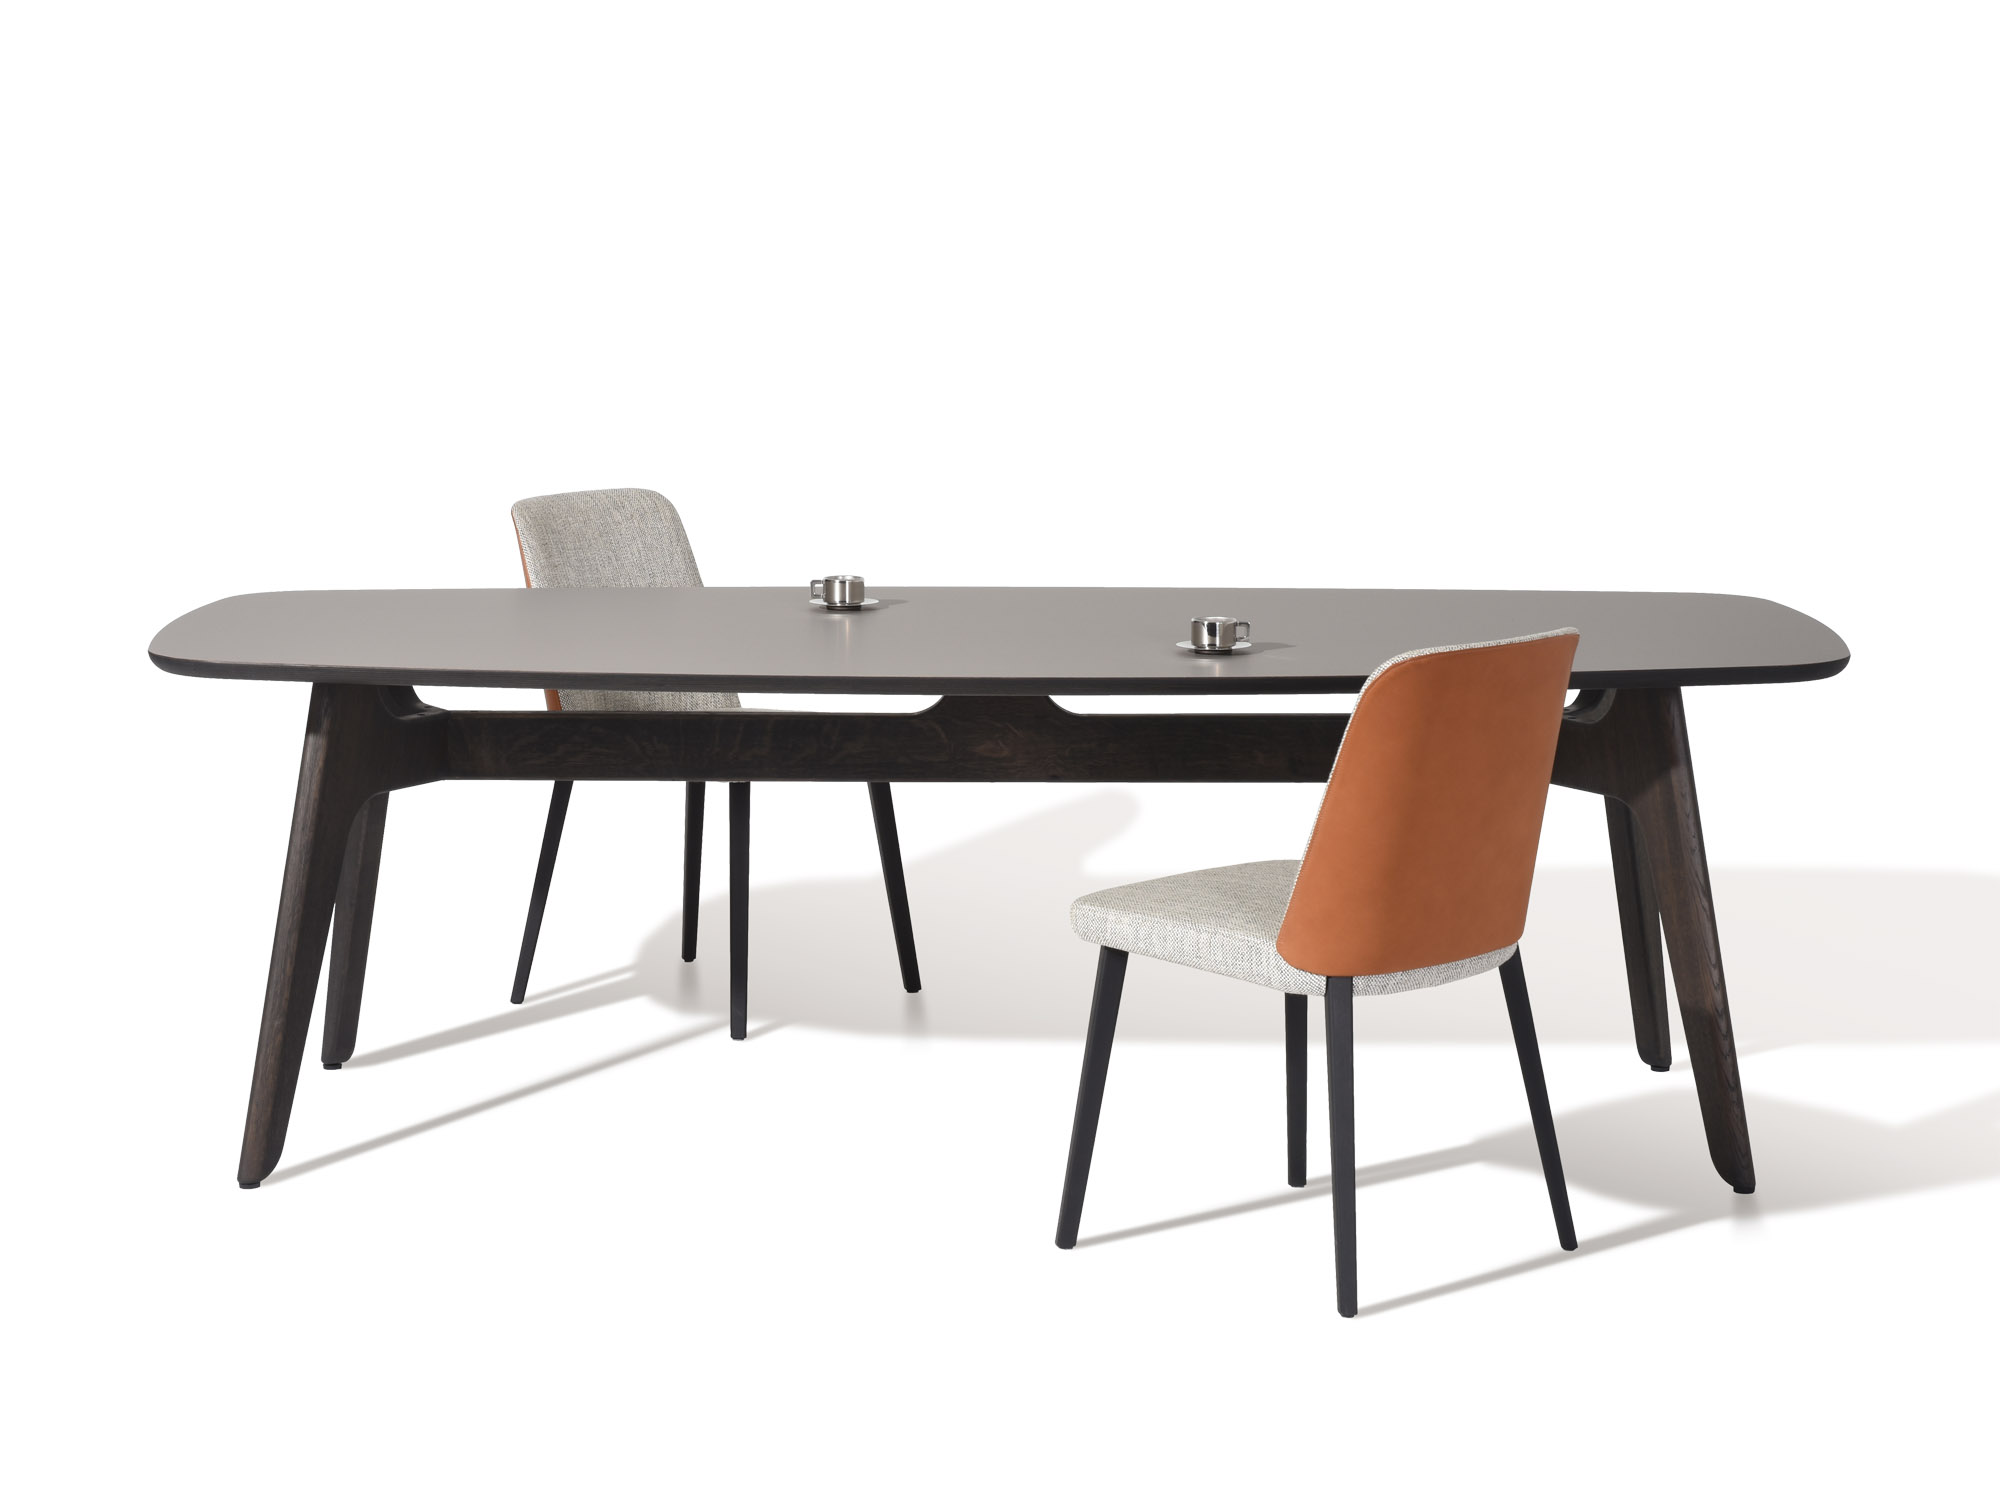 Castelijn Foliant - Design by Dick Spierenburg